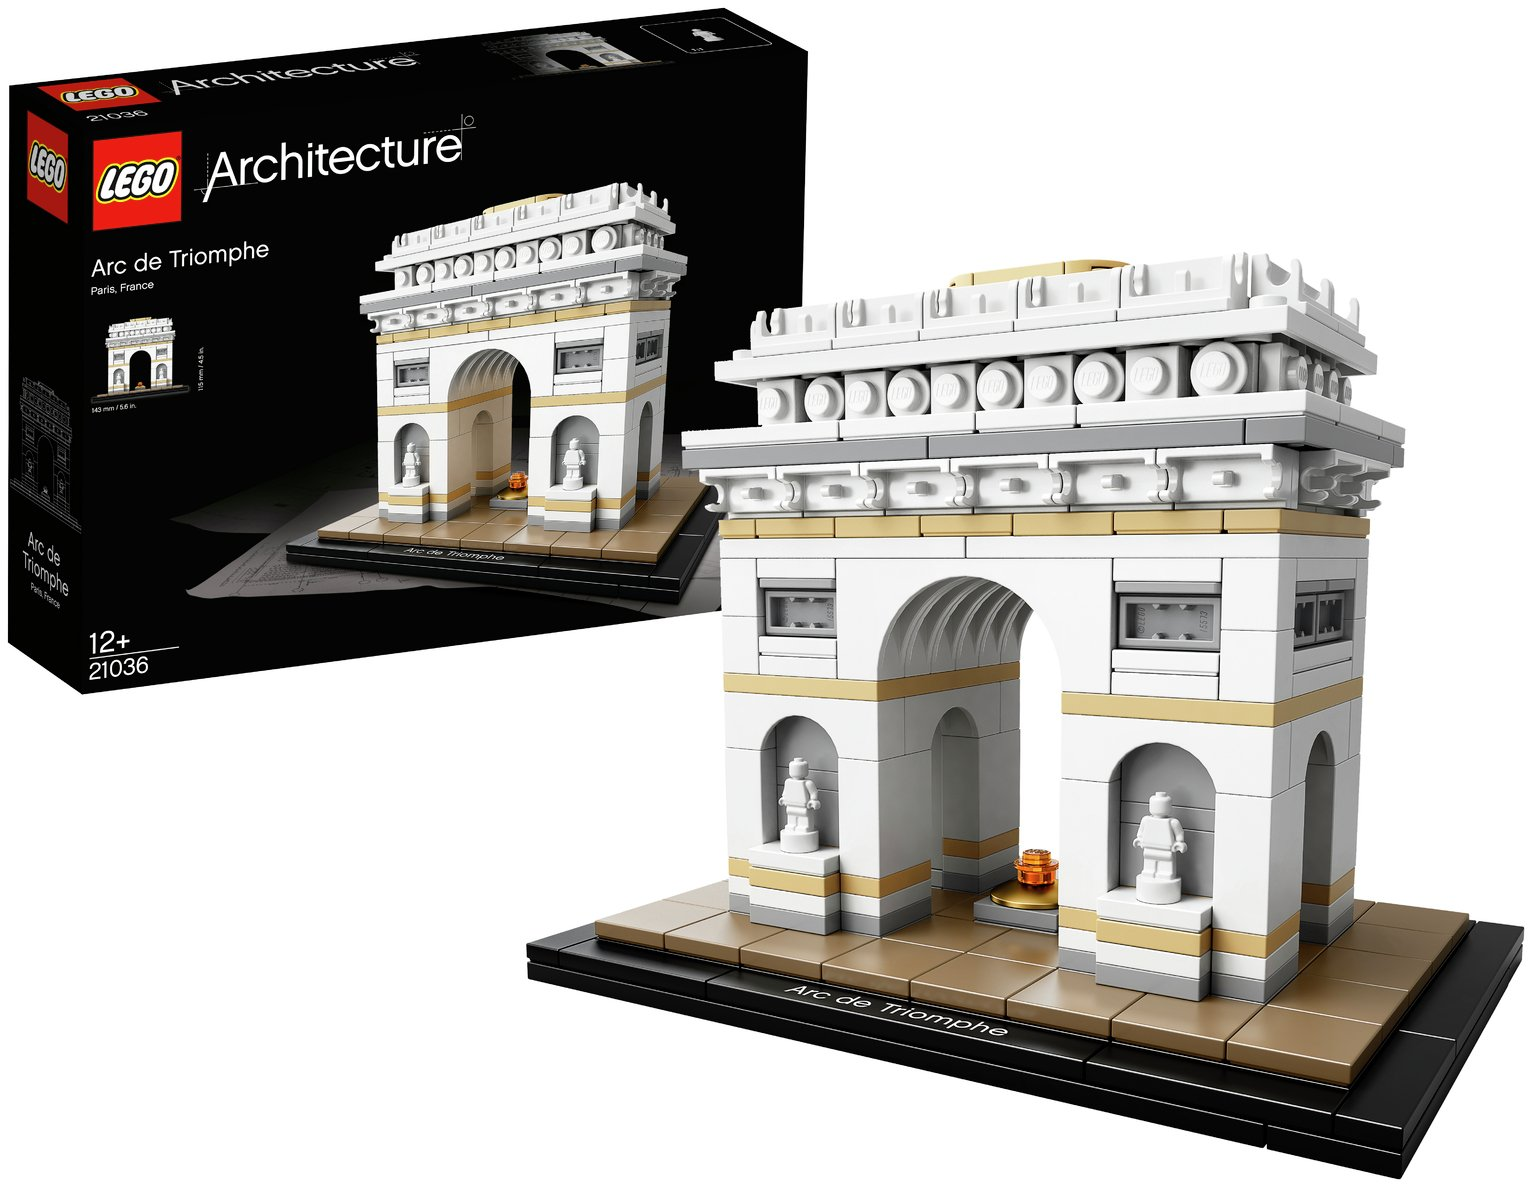 Image of LEGO Architecture Arc de Triomphe - 21036